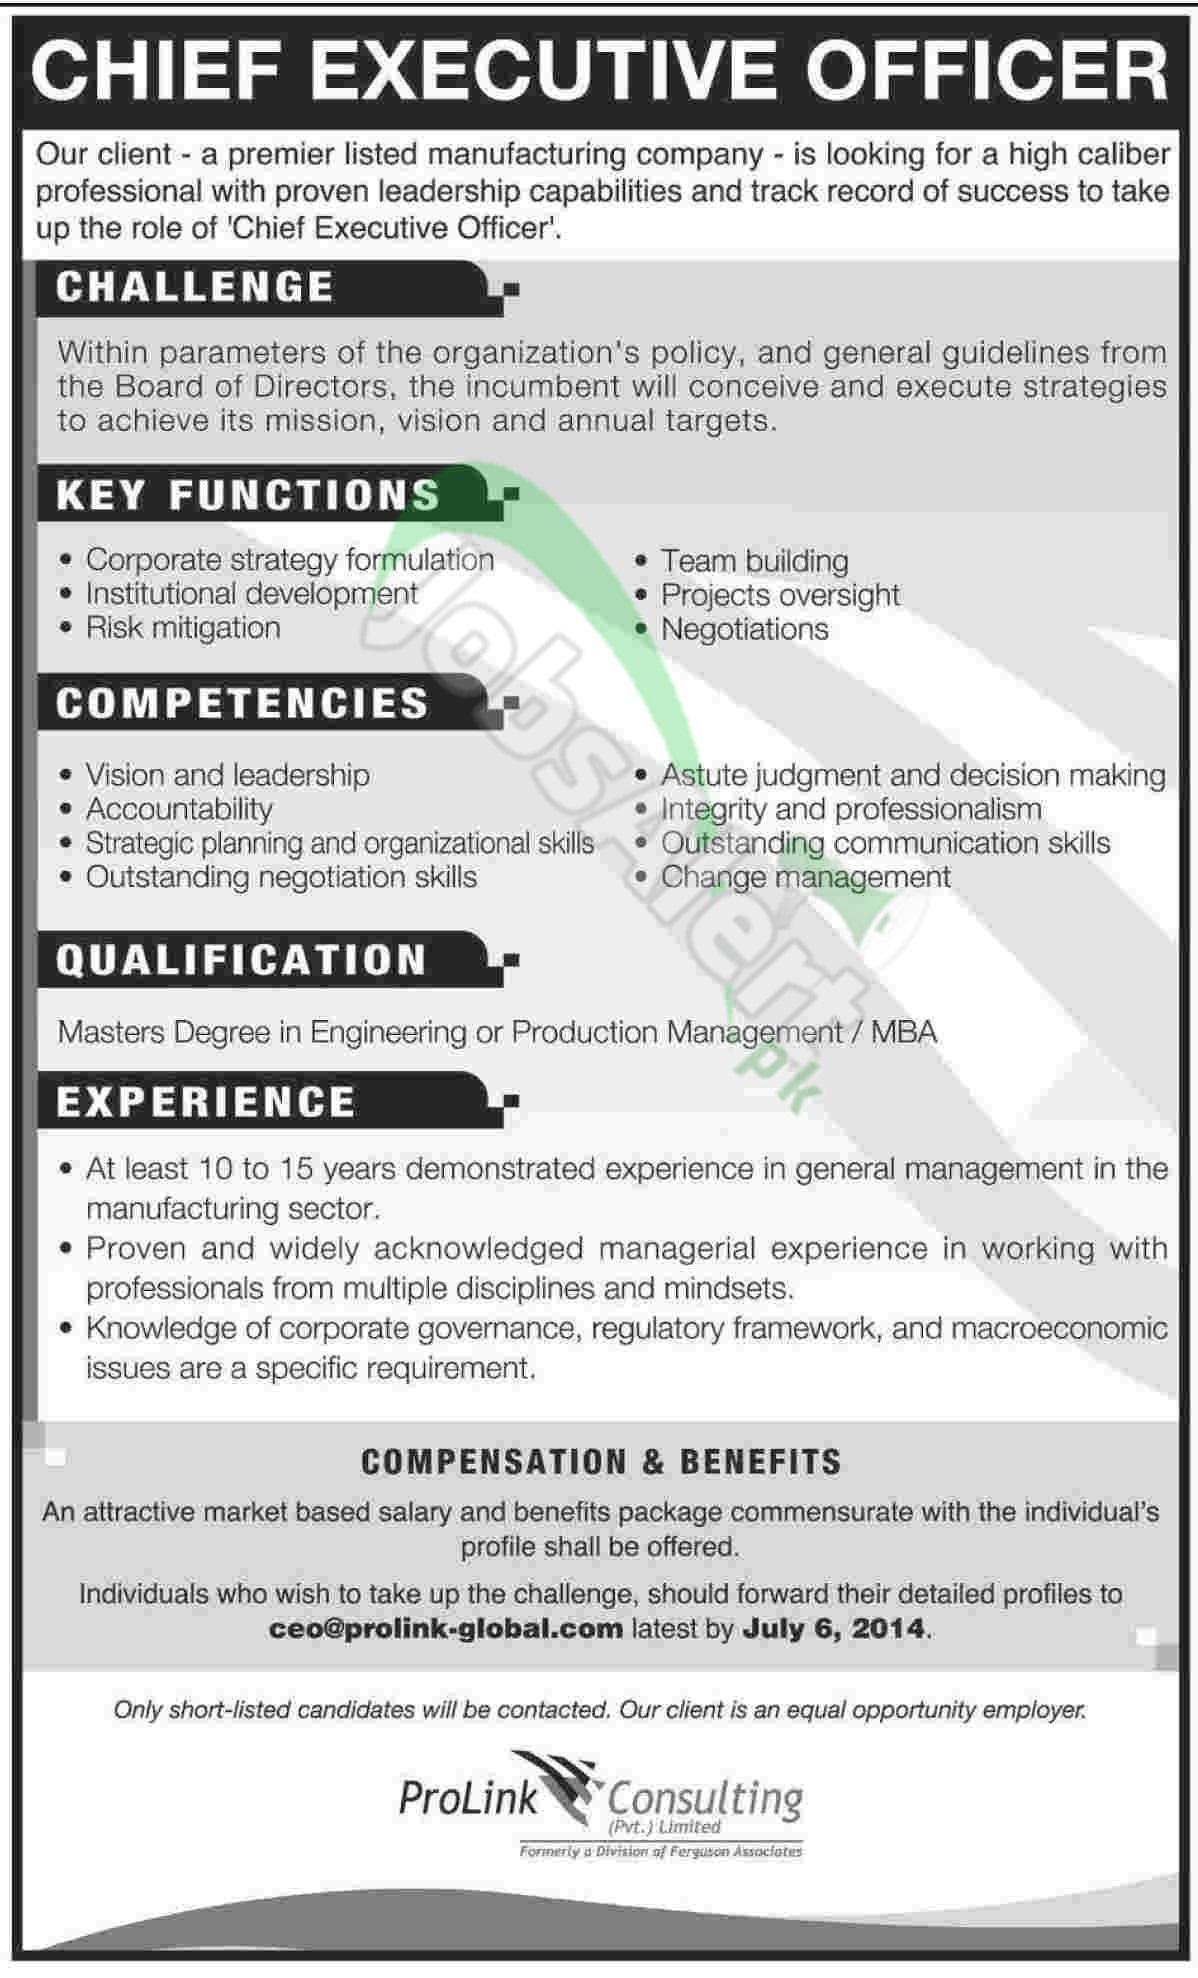 ProLink Consulting Pvt. Ltd.